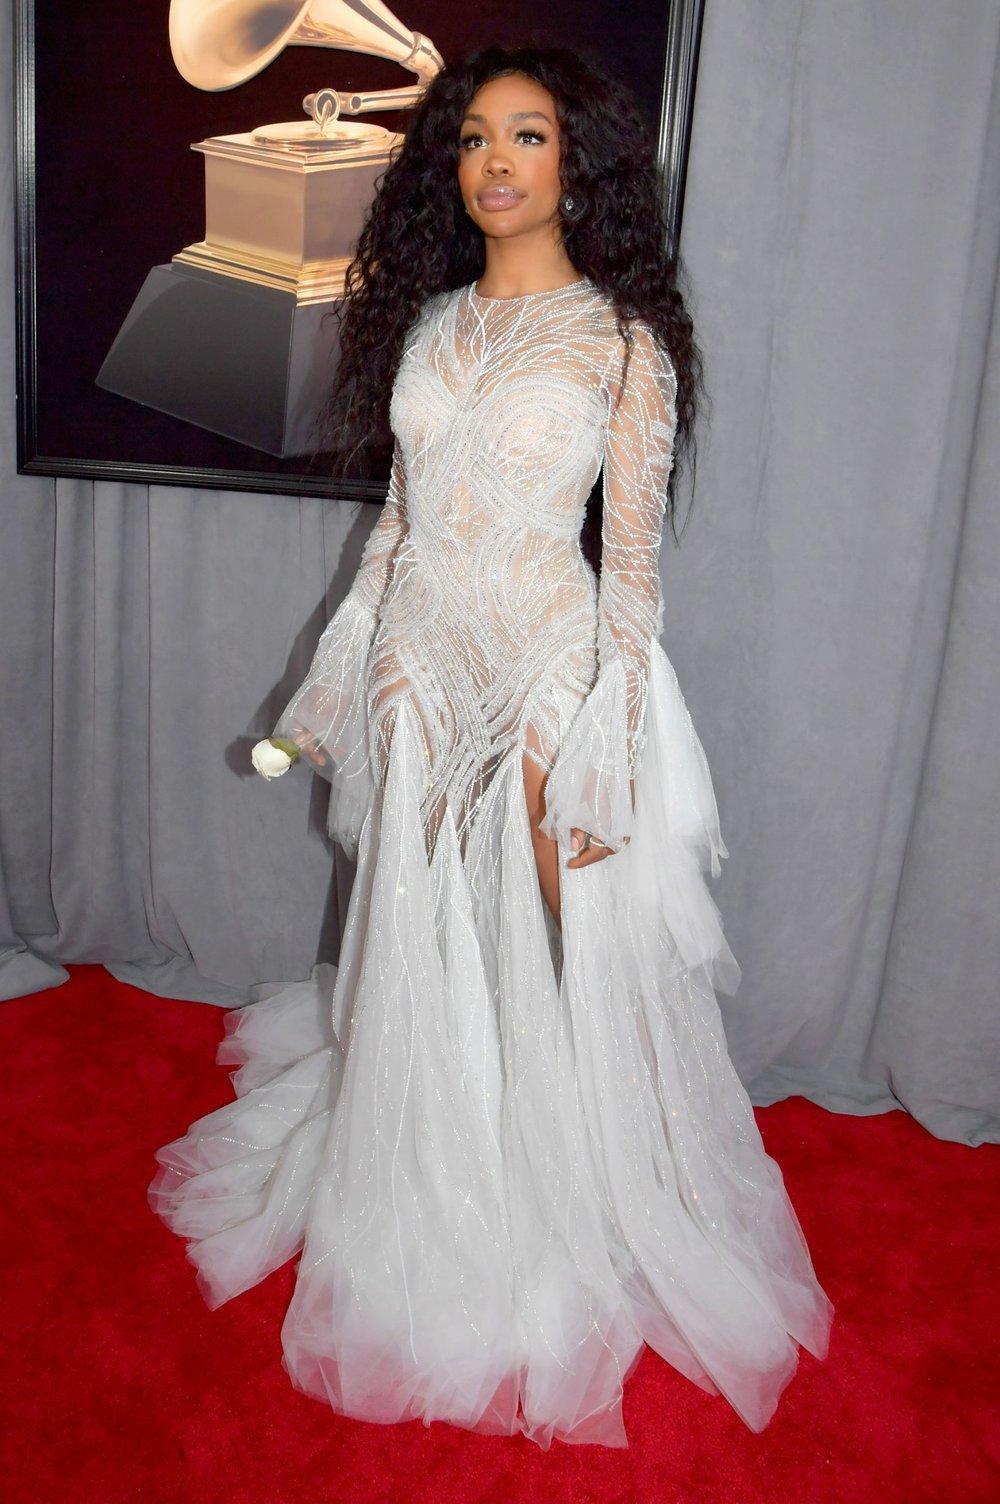 Grammys Awards 2018 - SZA in Atelier Versace.jpg